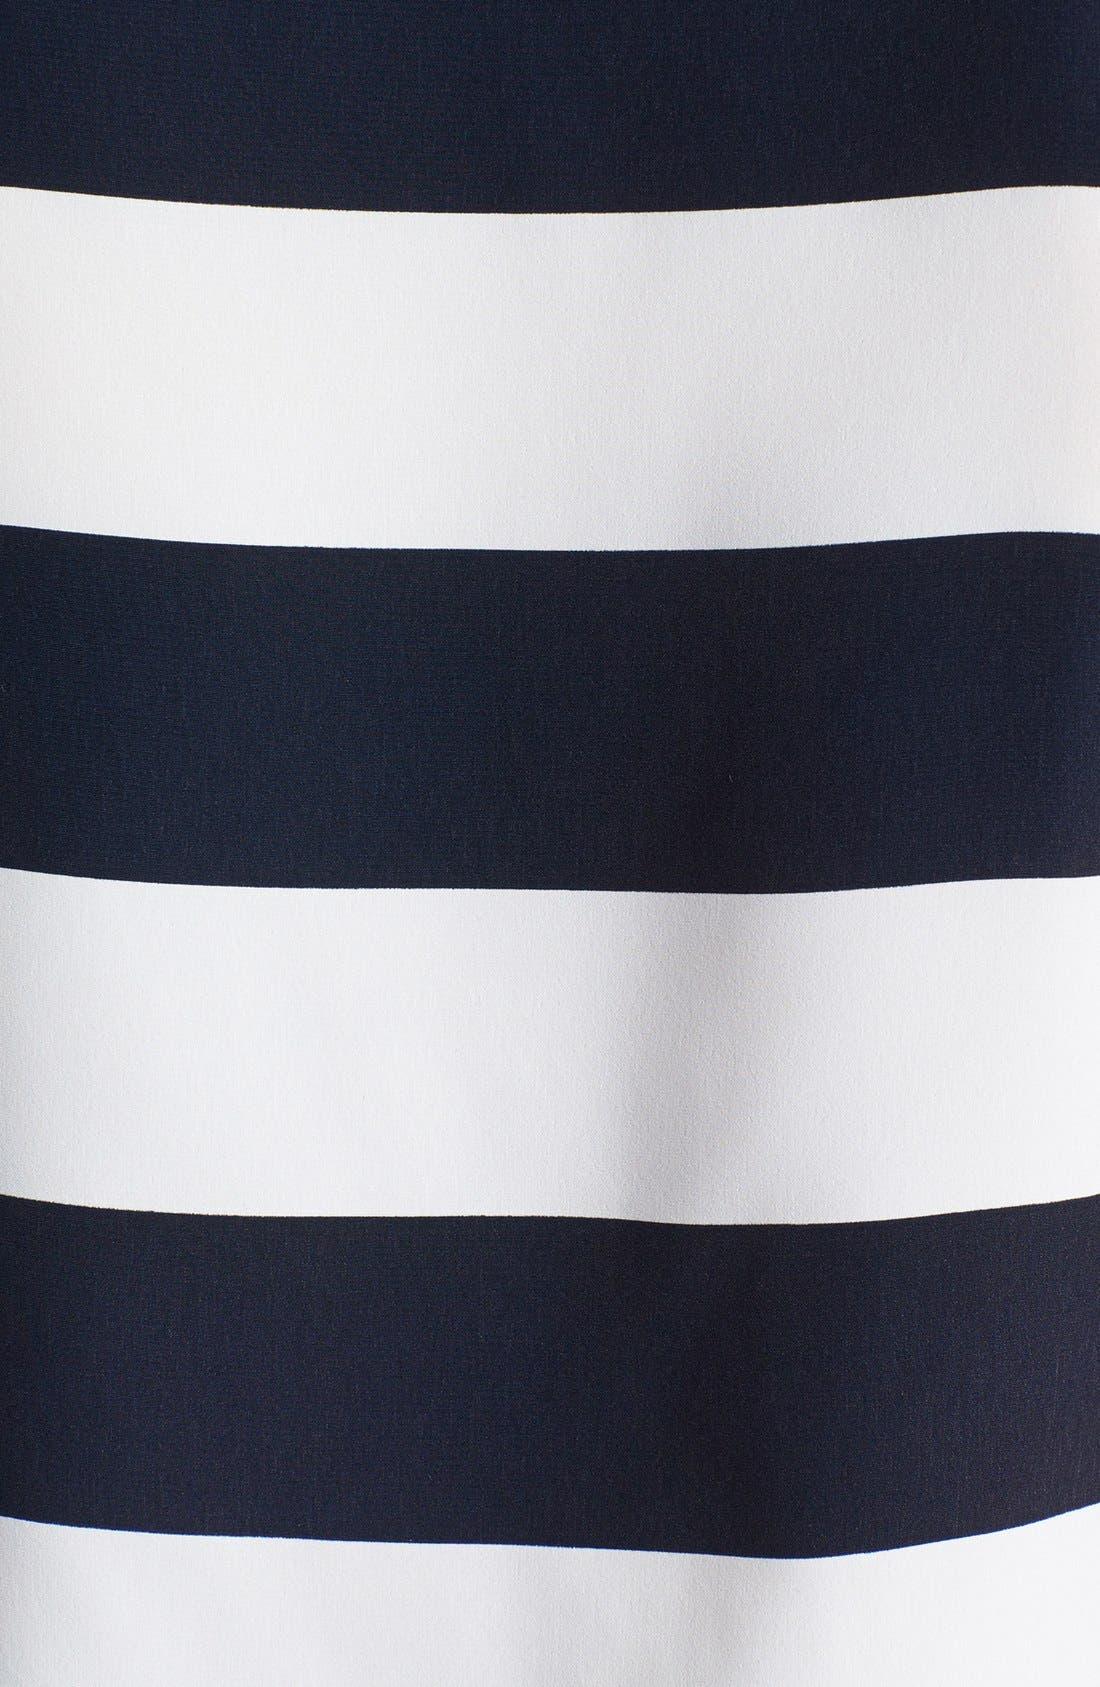 Alternate Image 3  - Vince Camuto 'Yacht Stripe' Boatneck Blouse (Regular & Petite)